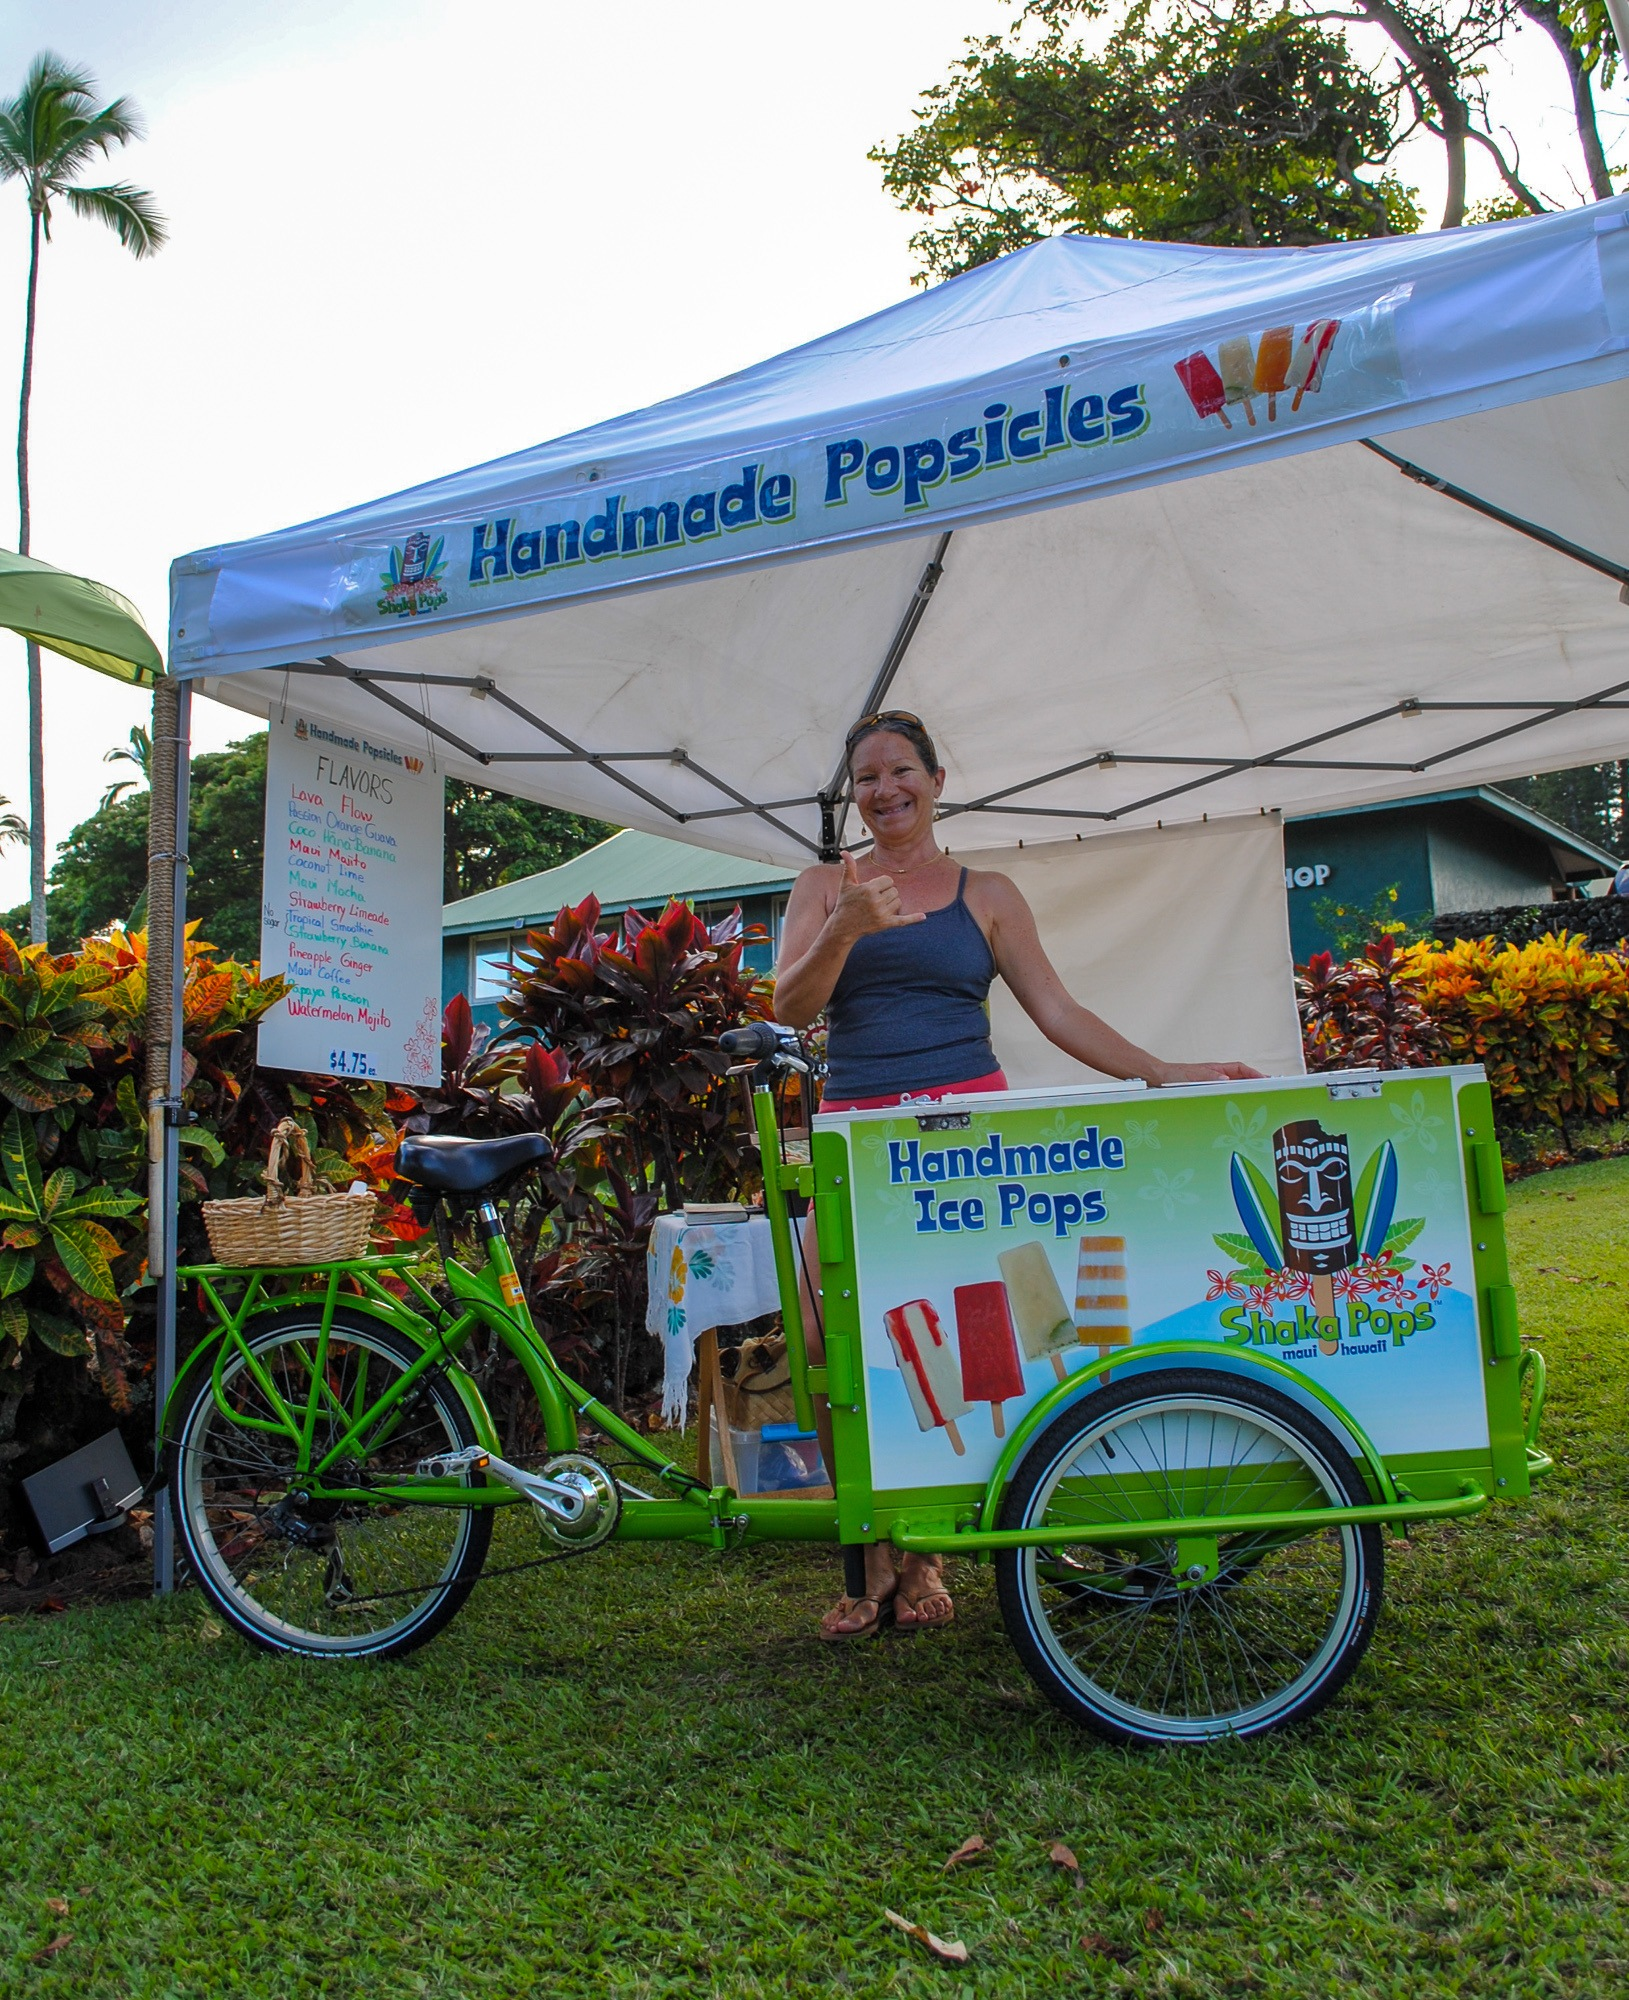 Ice pops for sale in Hana, Maui